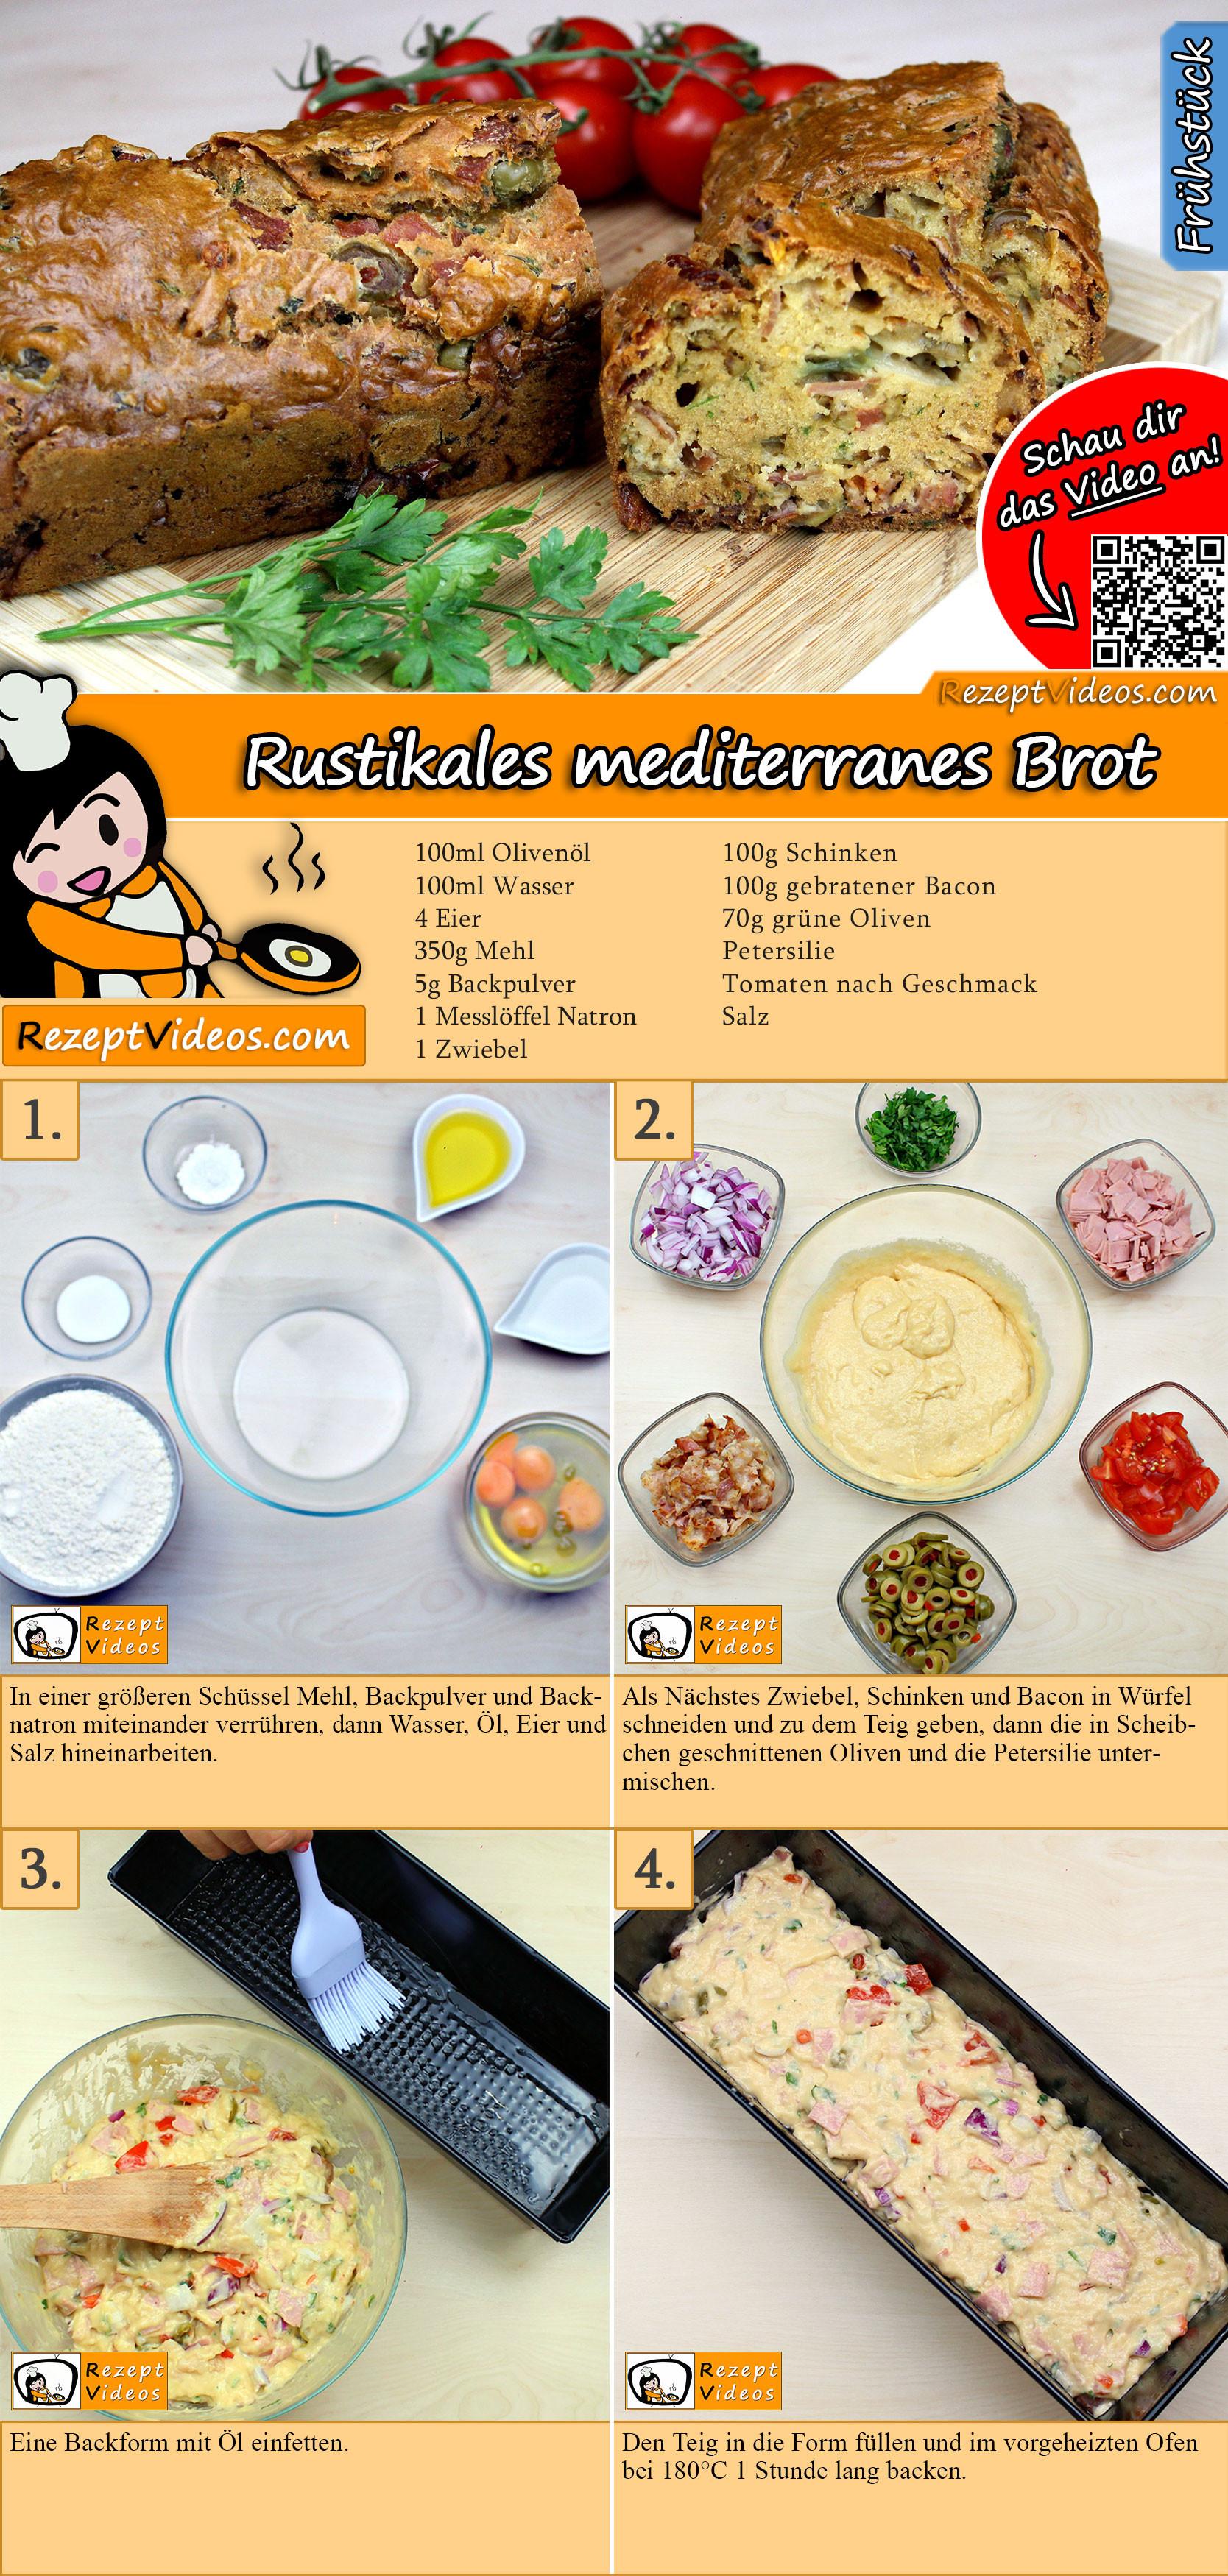 Rustikales mediterranes Brot Rezept mit Video